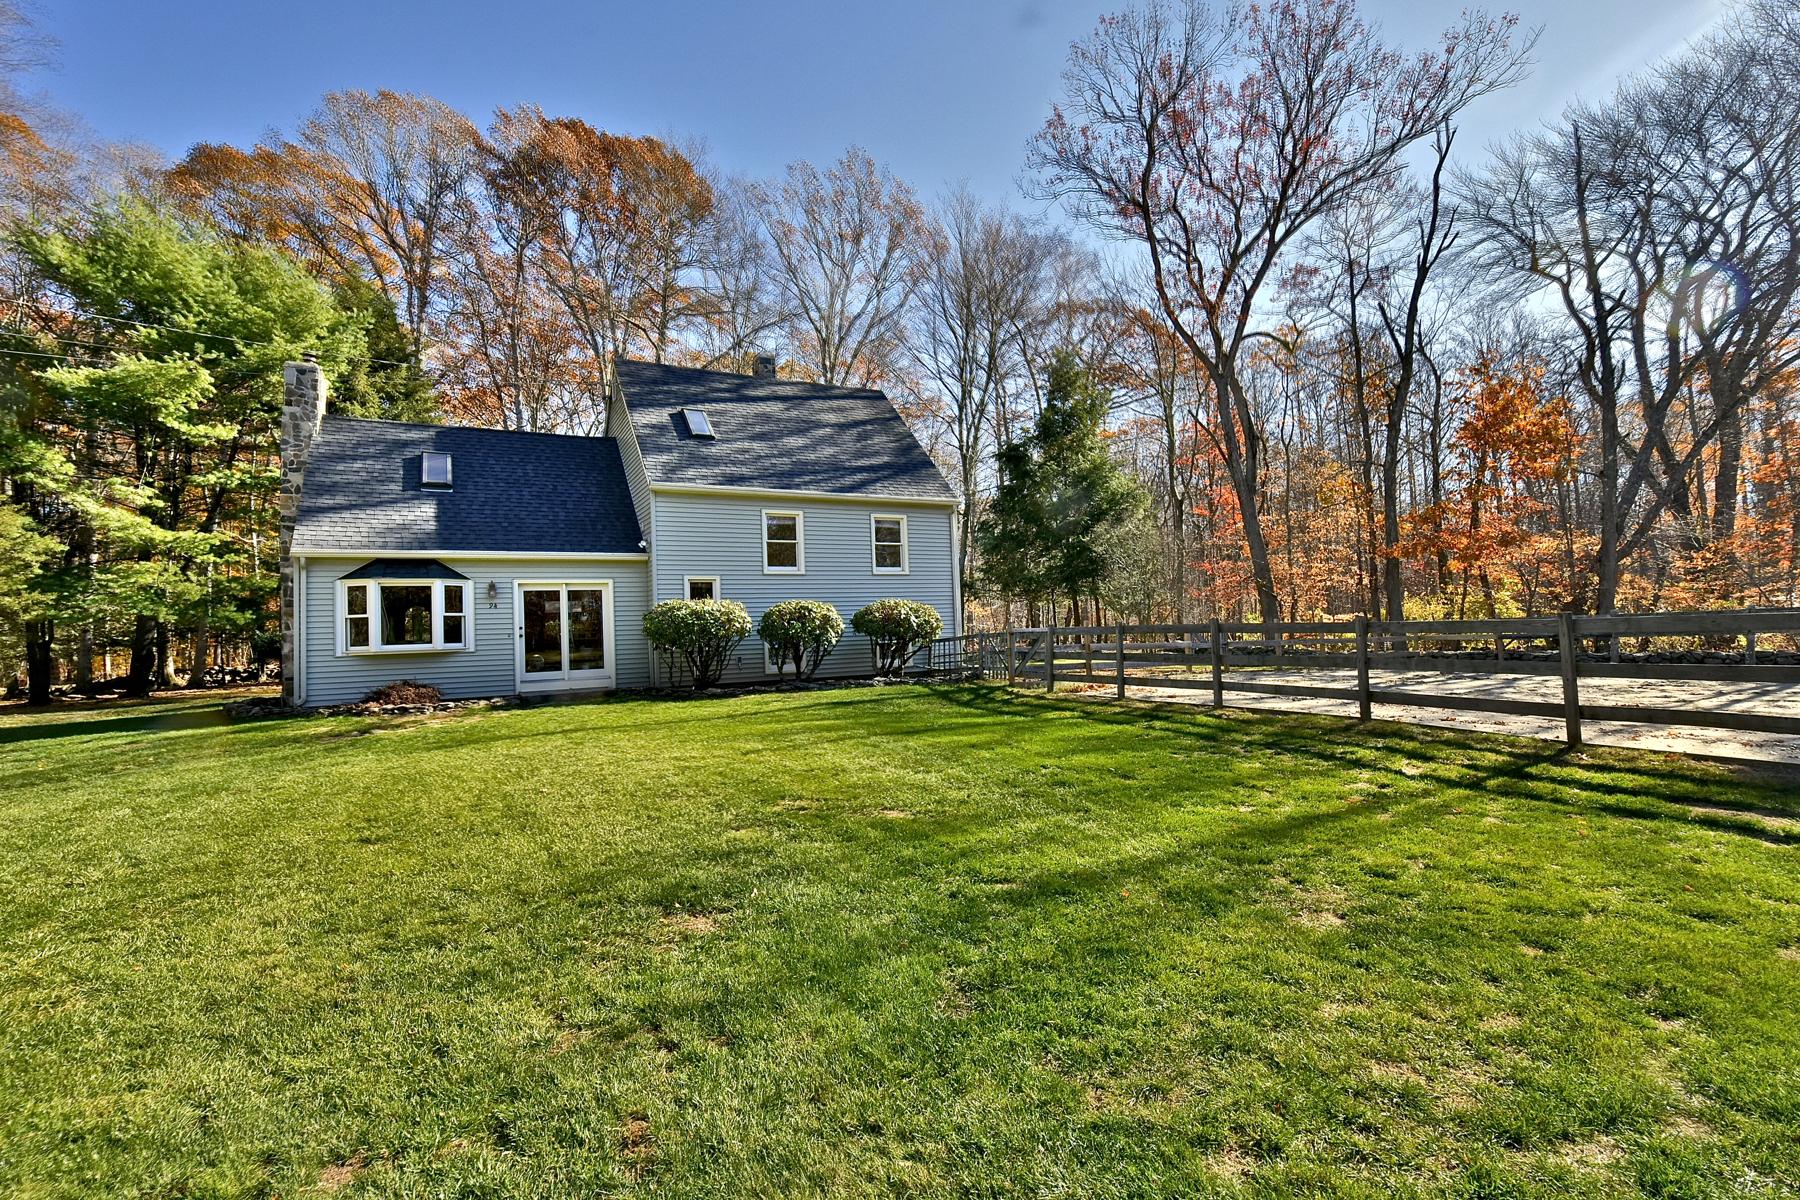 Nhà ở một gia đình vì Bán tại Great Horse Farm! Cape on 2+ Acres 94 Route 80 Killingworth, Connecticut, 06419 Hoa Kỳ